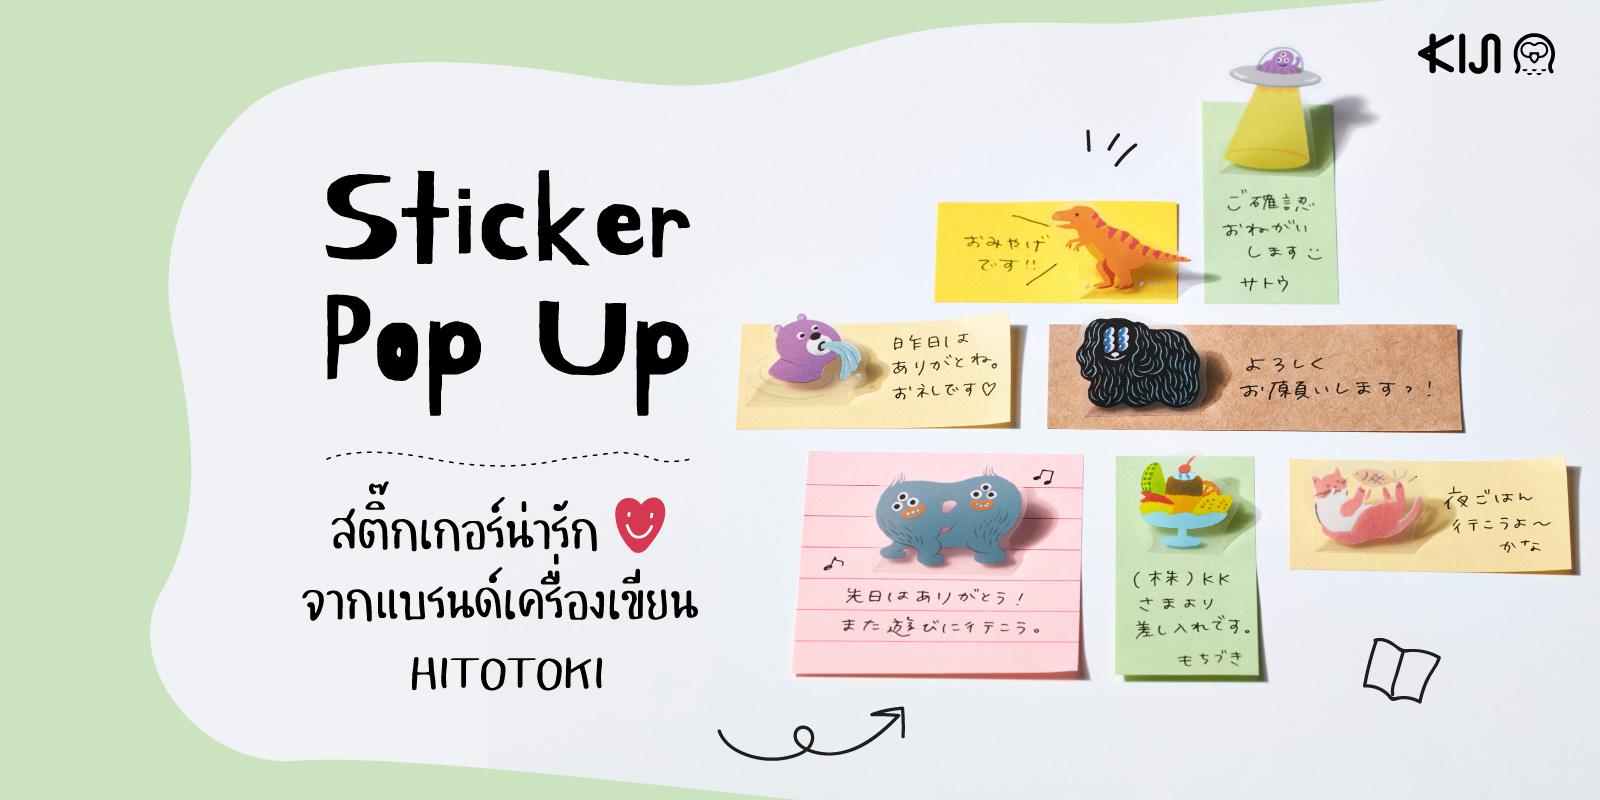 Sticker Pop Up จากแบรนด์เครื่องเขียน HITOTOKI